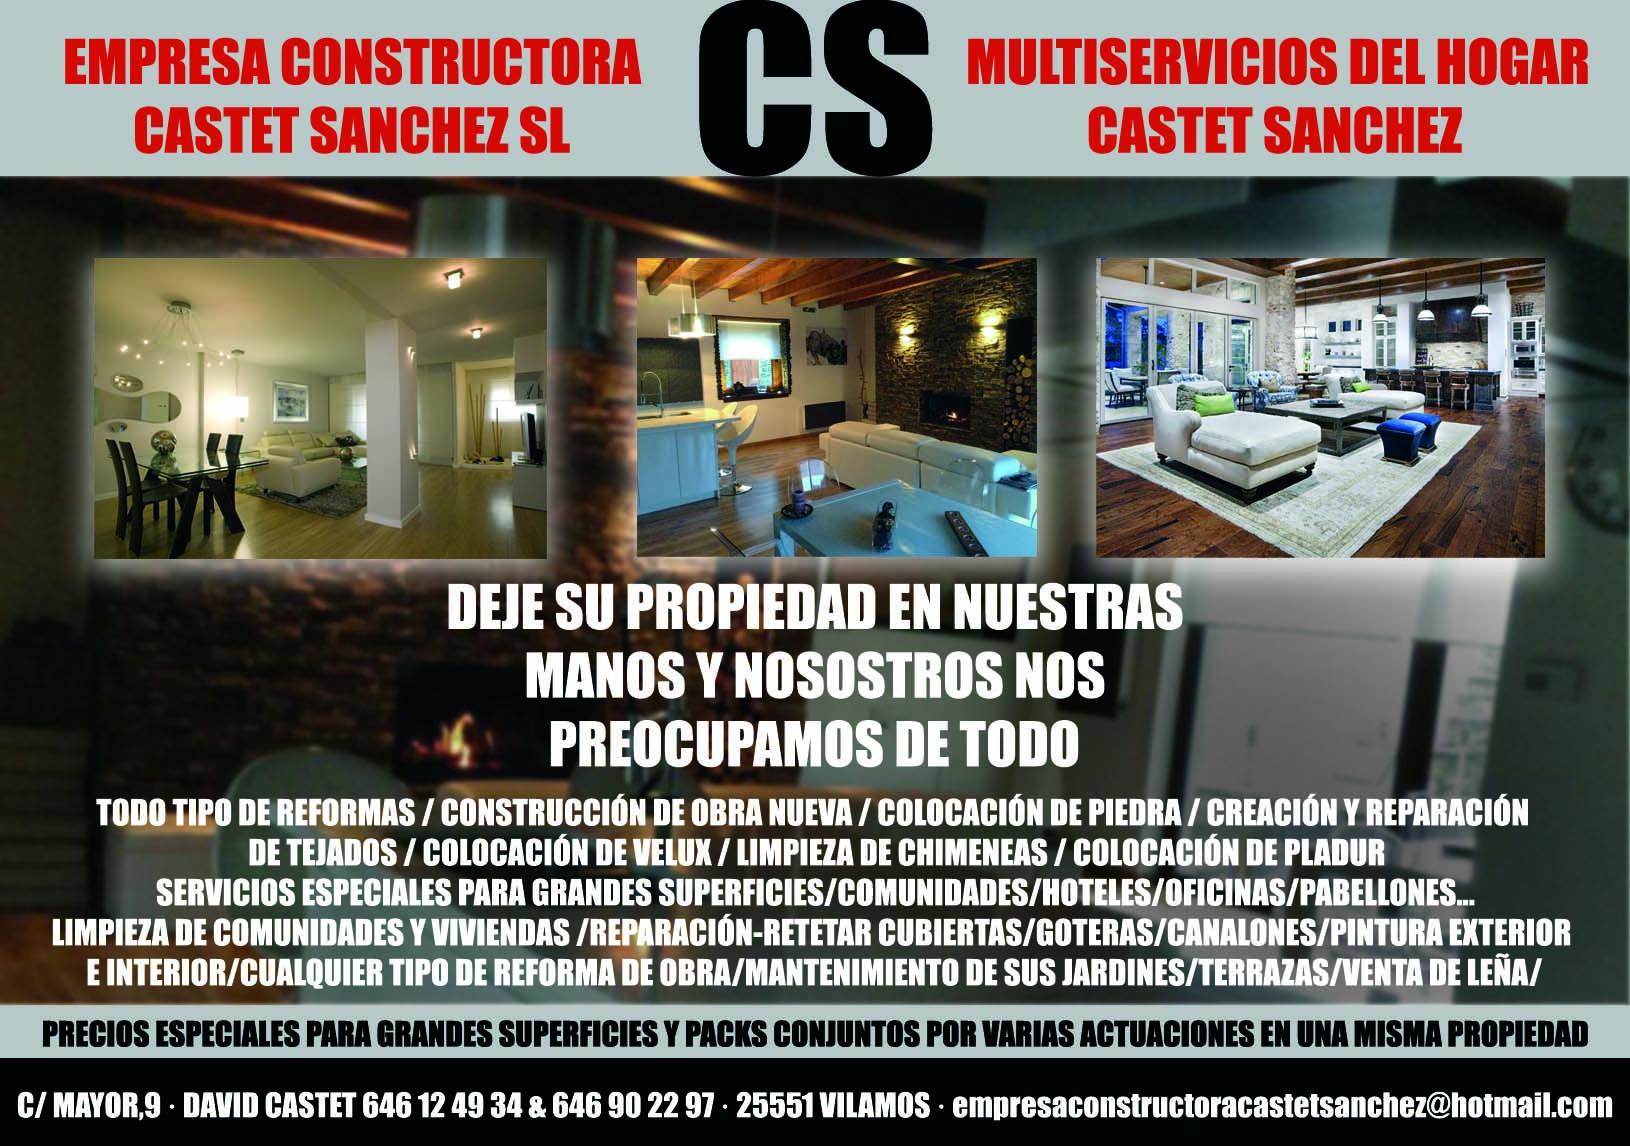 Empresa Constructora Castet Sanchez S.l